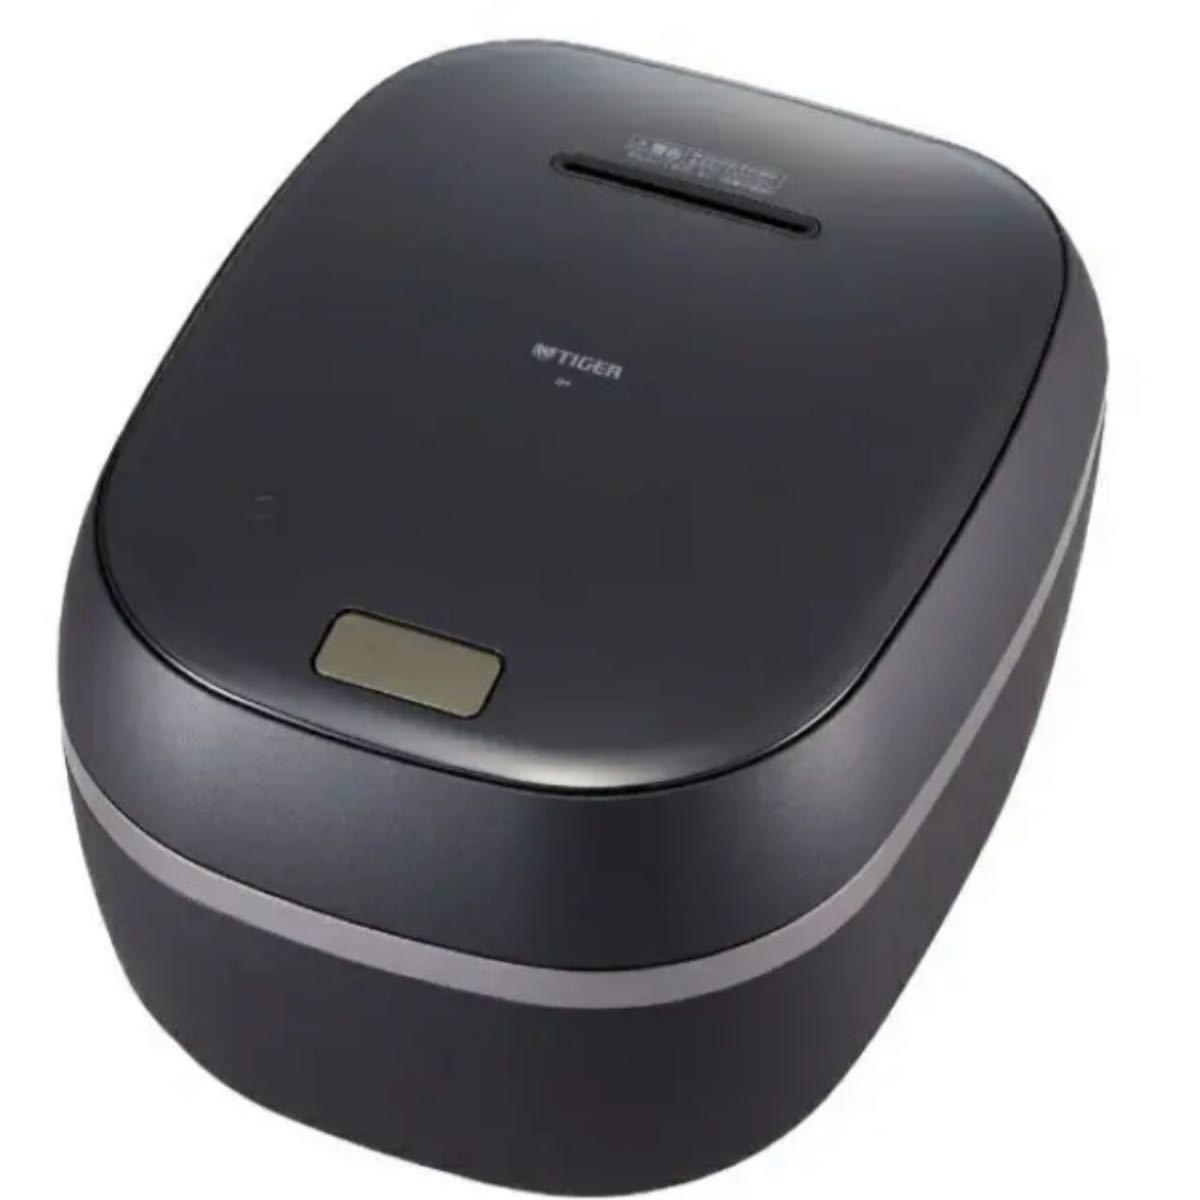 【新品未使用】タイガー 土鍋 圧力IH 炊飯器 5.5合 JPG-S100KS